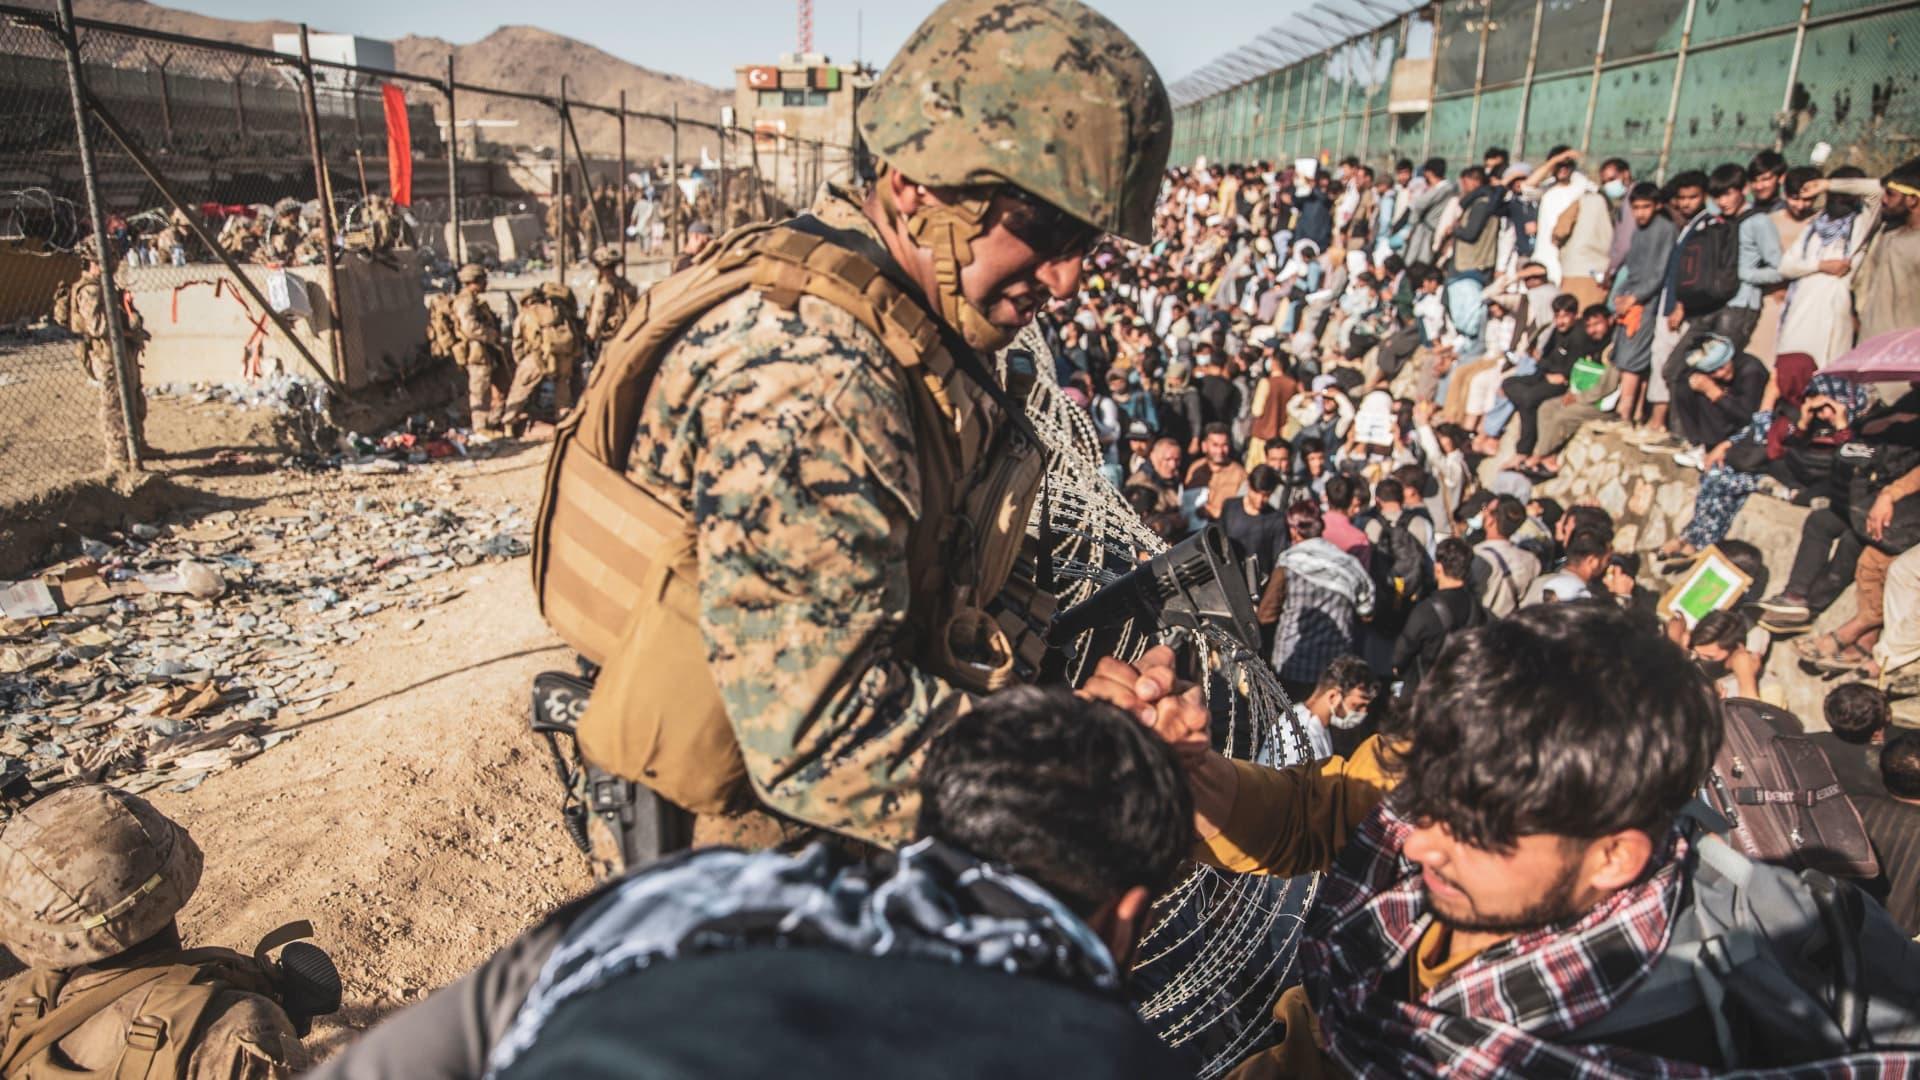 A U.S. Marine assists at an Evacuation Control Check Point (ECC) during an evacuation at Hamid Karzai International Airport, Kabul, Afghanistan, August 26, 2021.